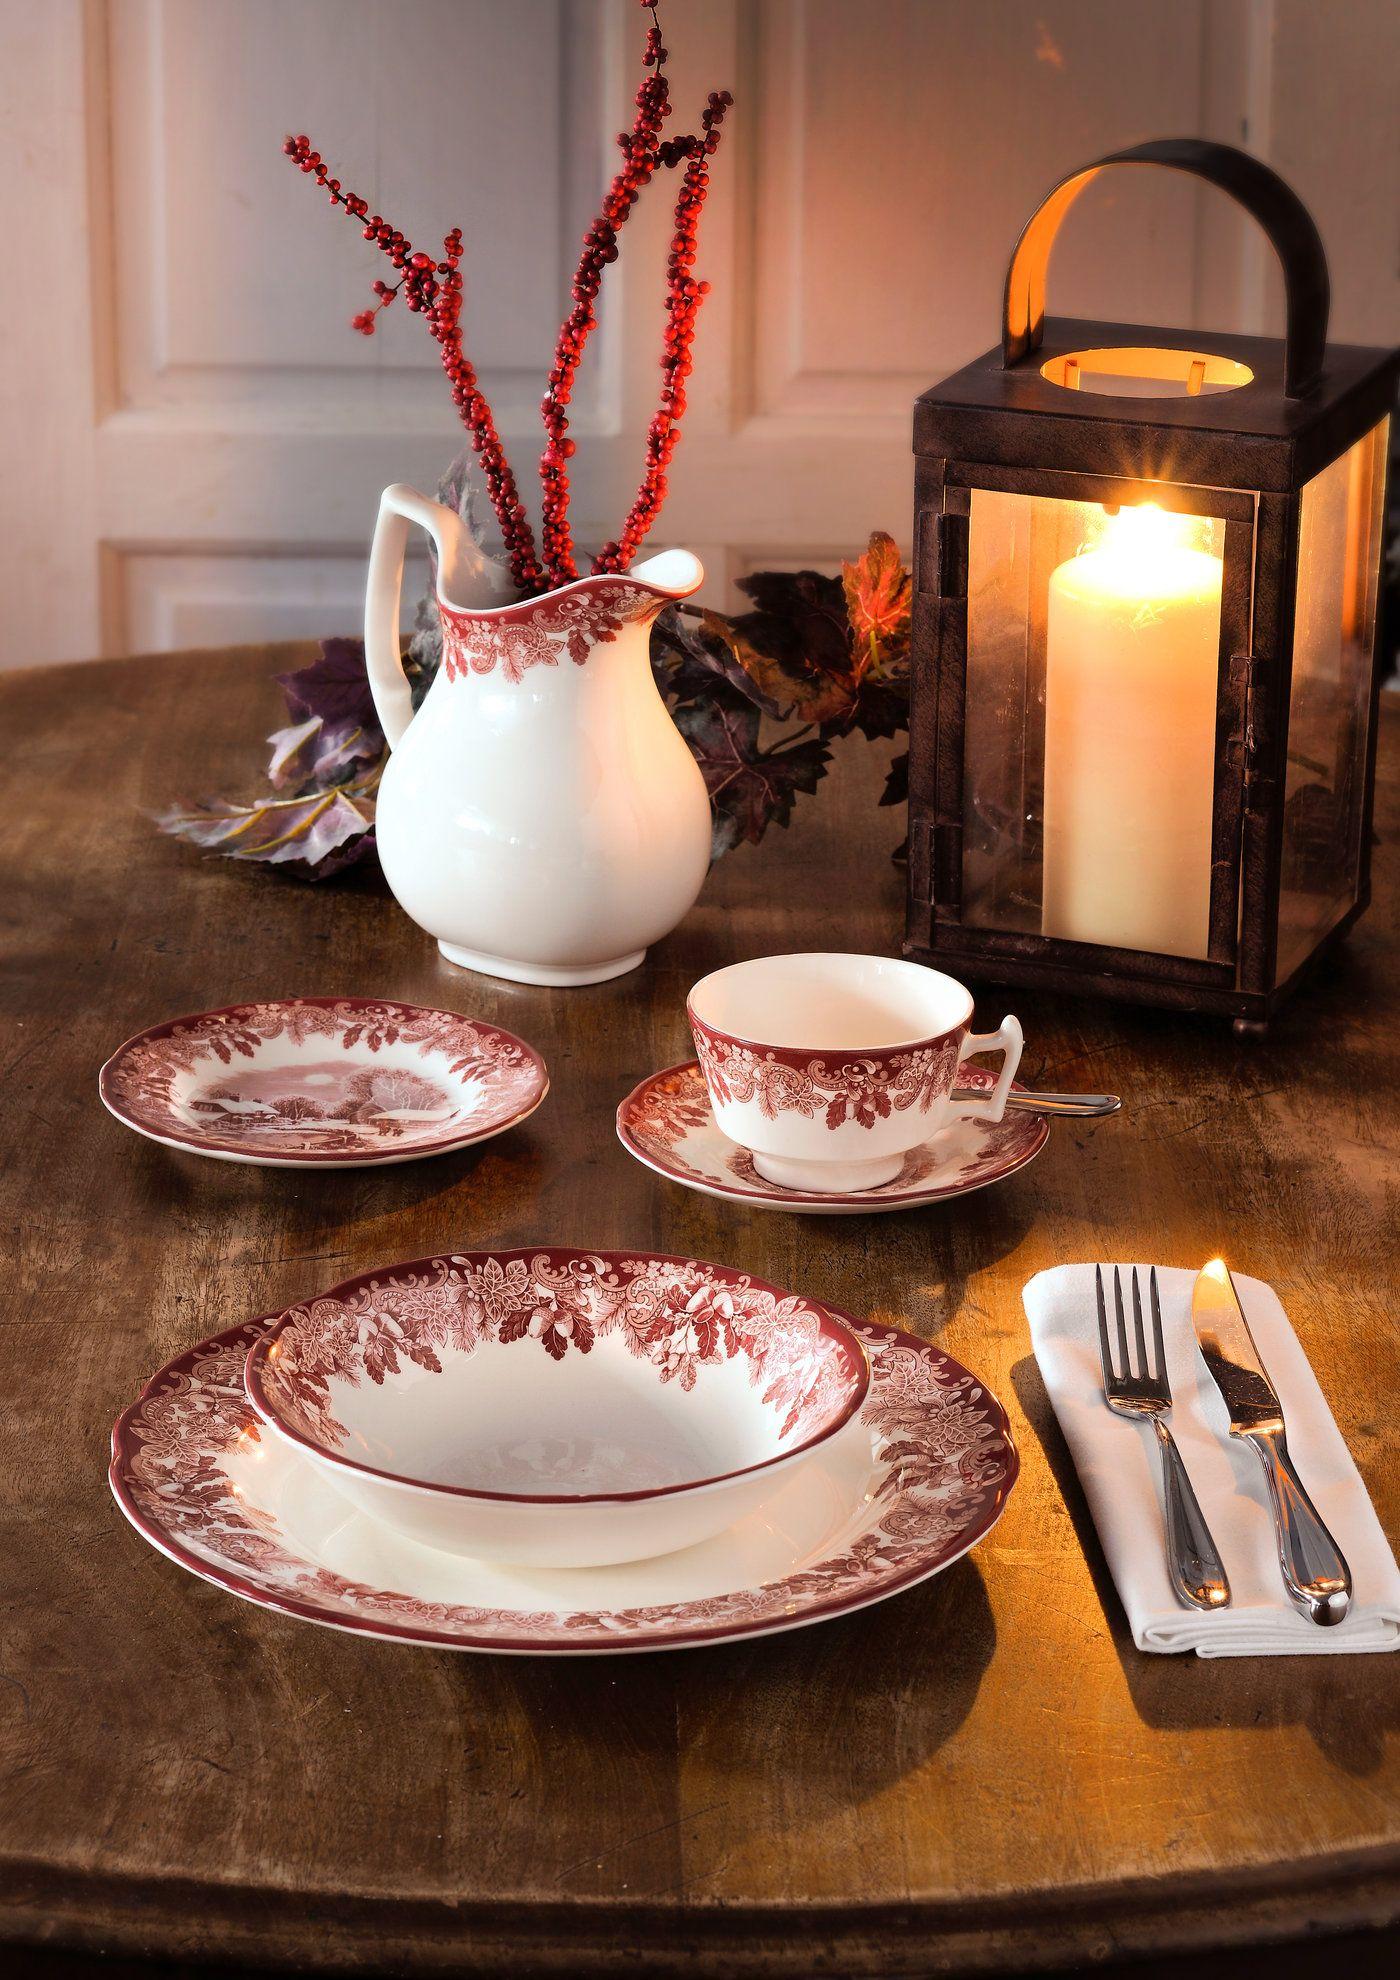 Spode Winter S Scene Cereal Bowl Set Of 4 Tableware Dinner Plates Winter Dishes